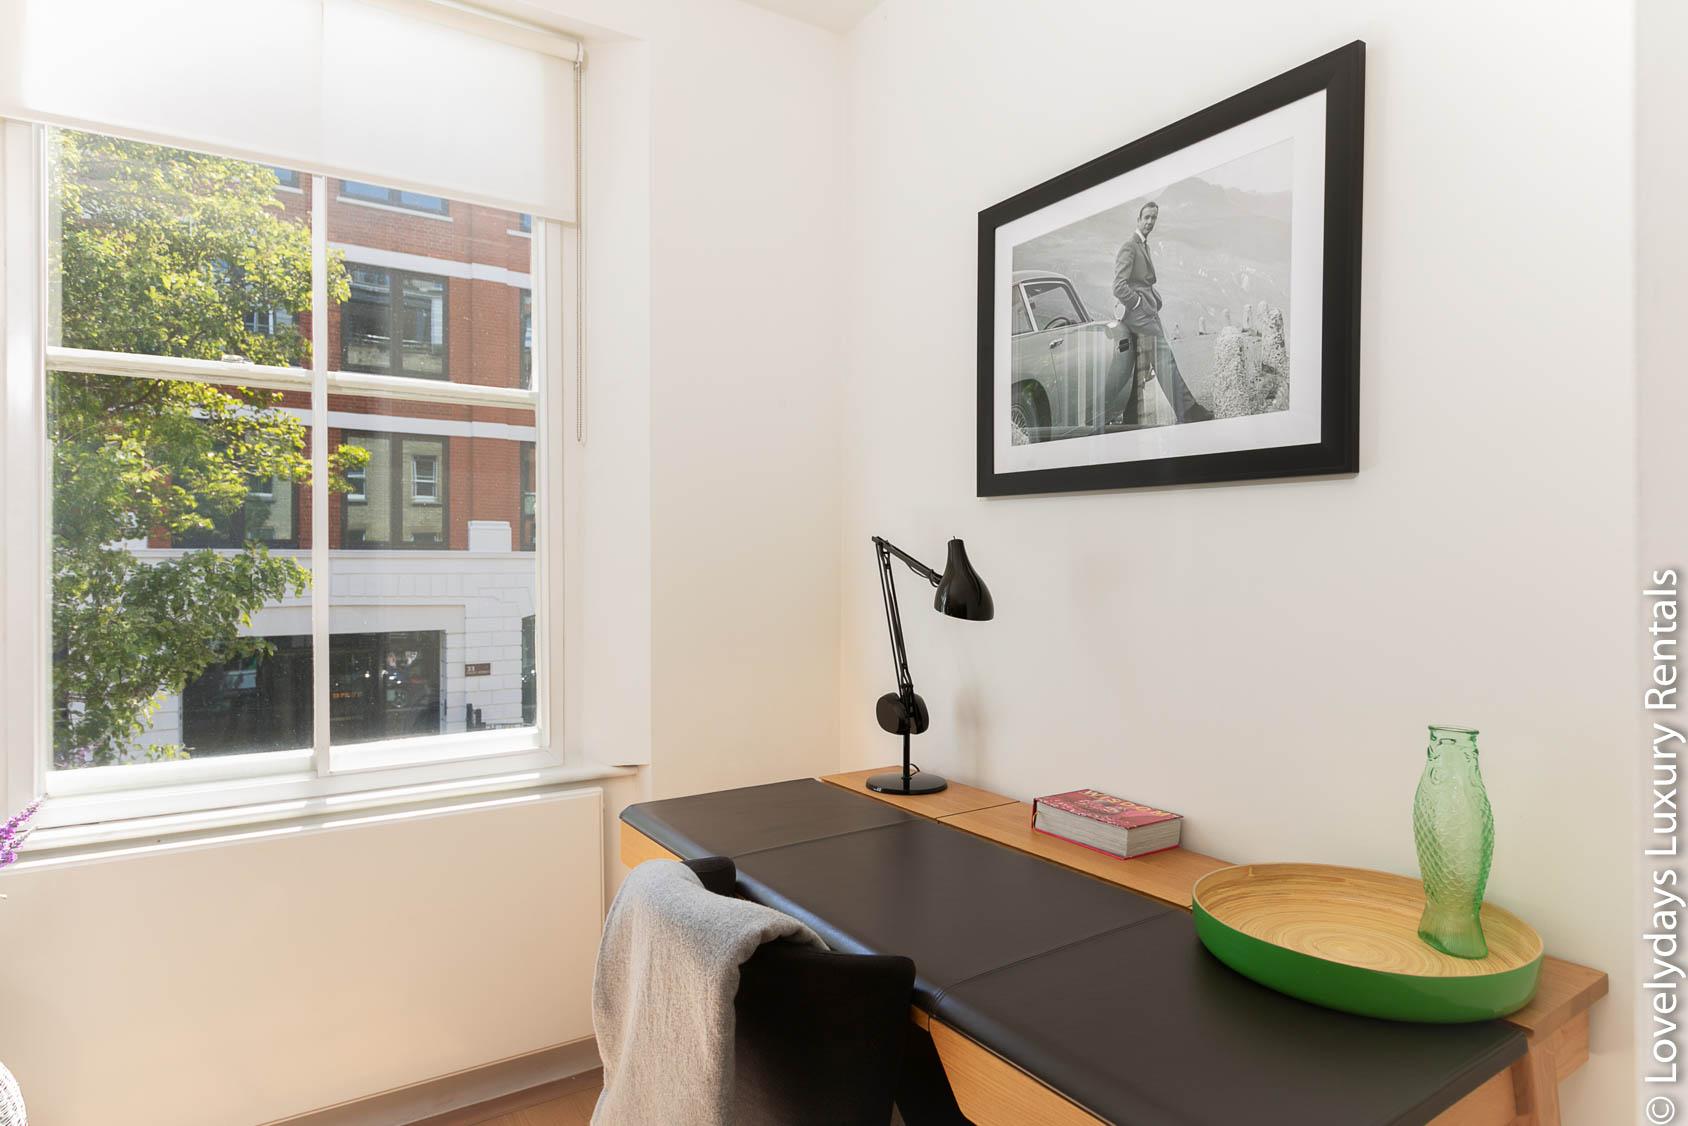 Lovelydays luxury service apartment rental - London - Fitzrovia - Foley Street - Lovelysuite - 2 bedrooms - 2 bathrooms - Working desk - 7278912e37db - Lovelydays